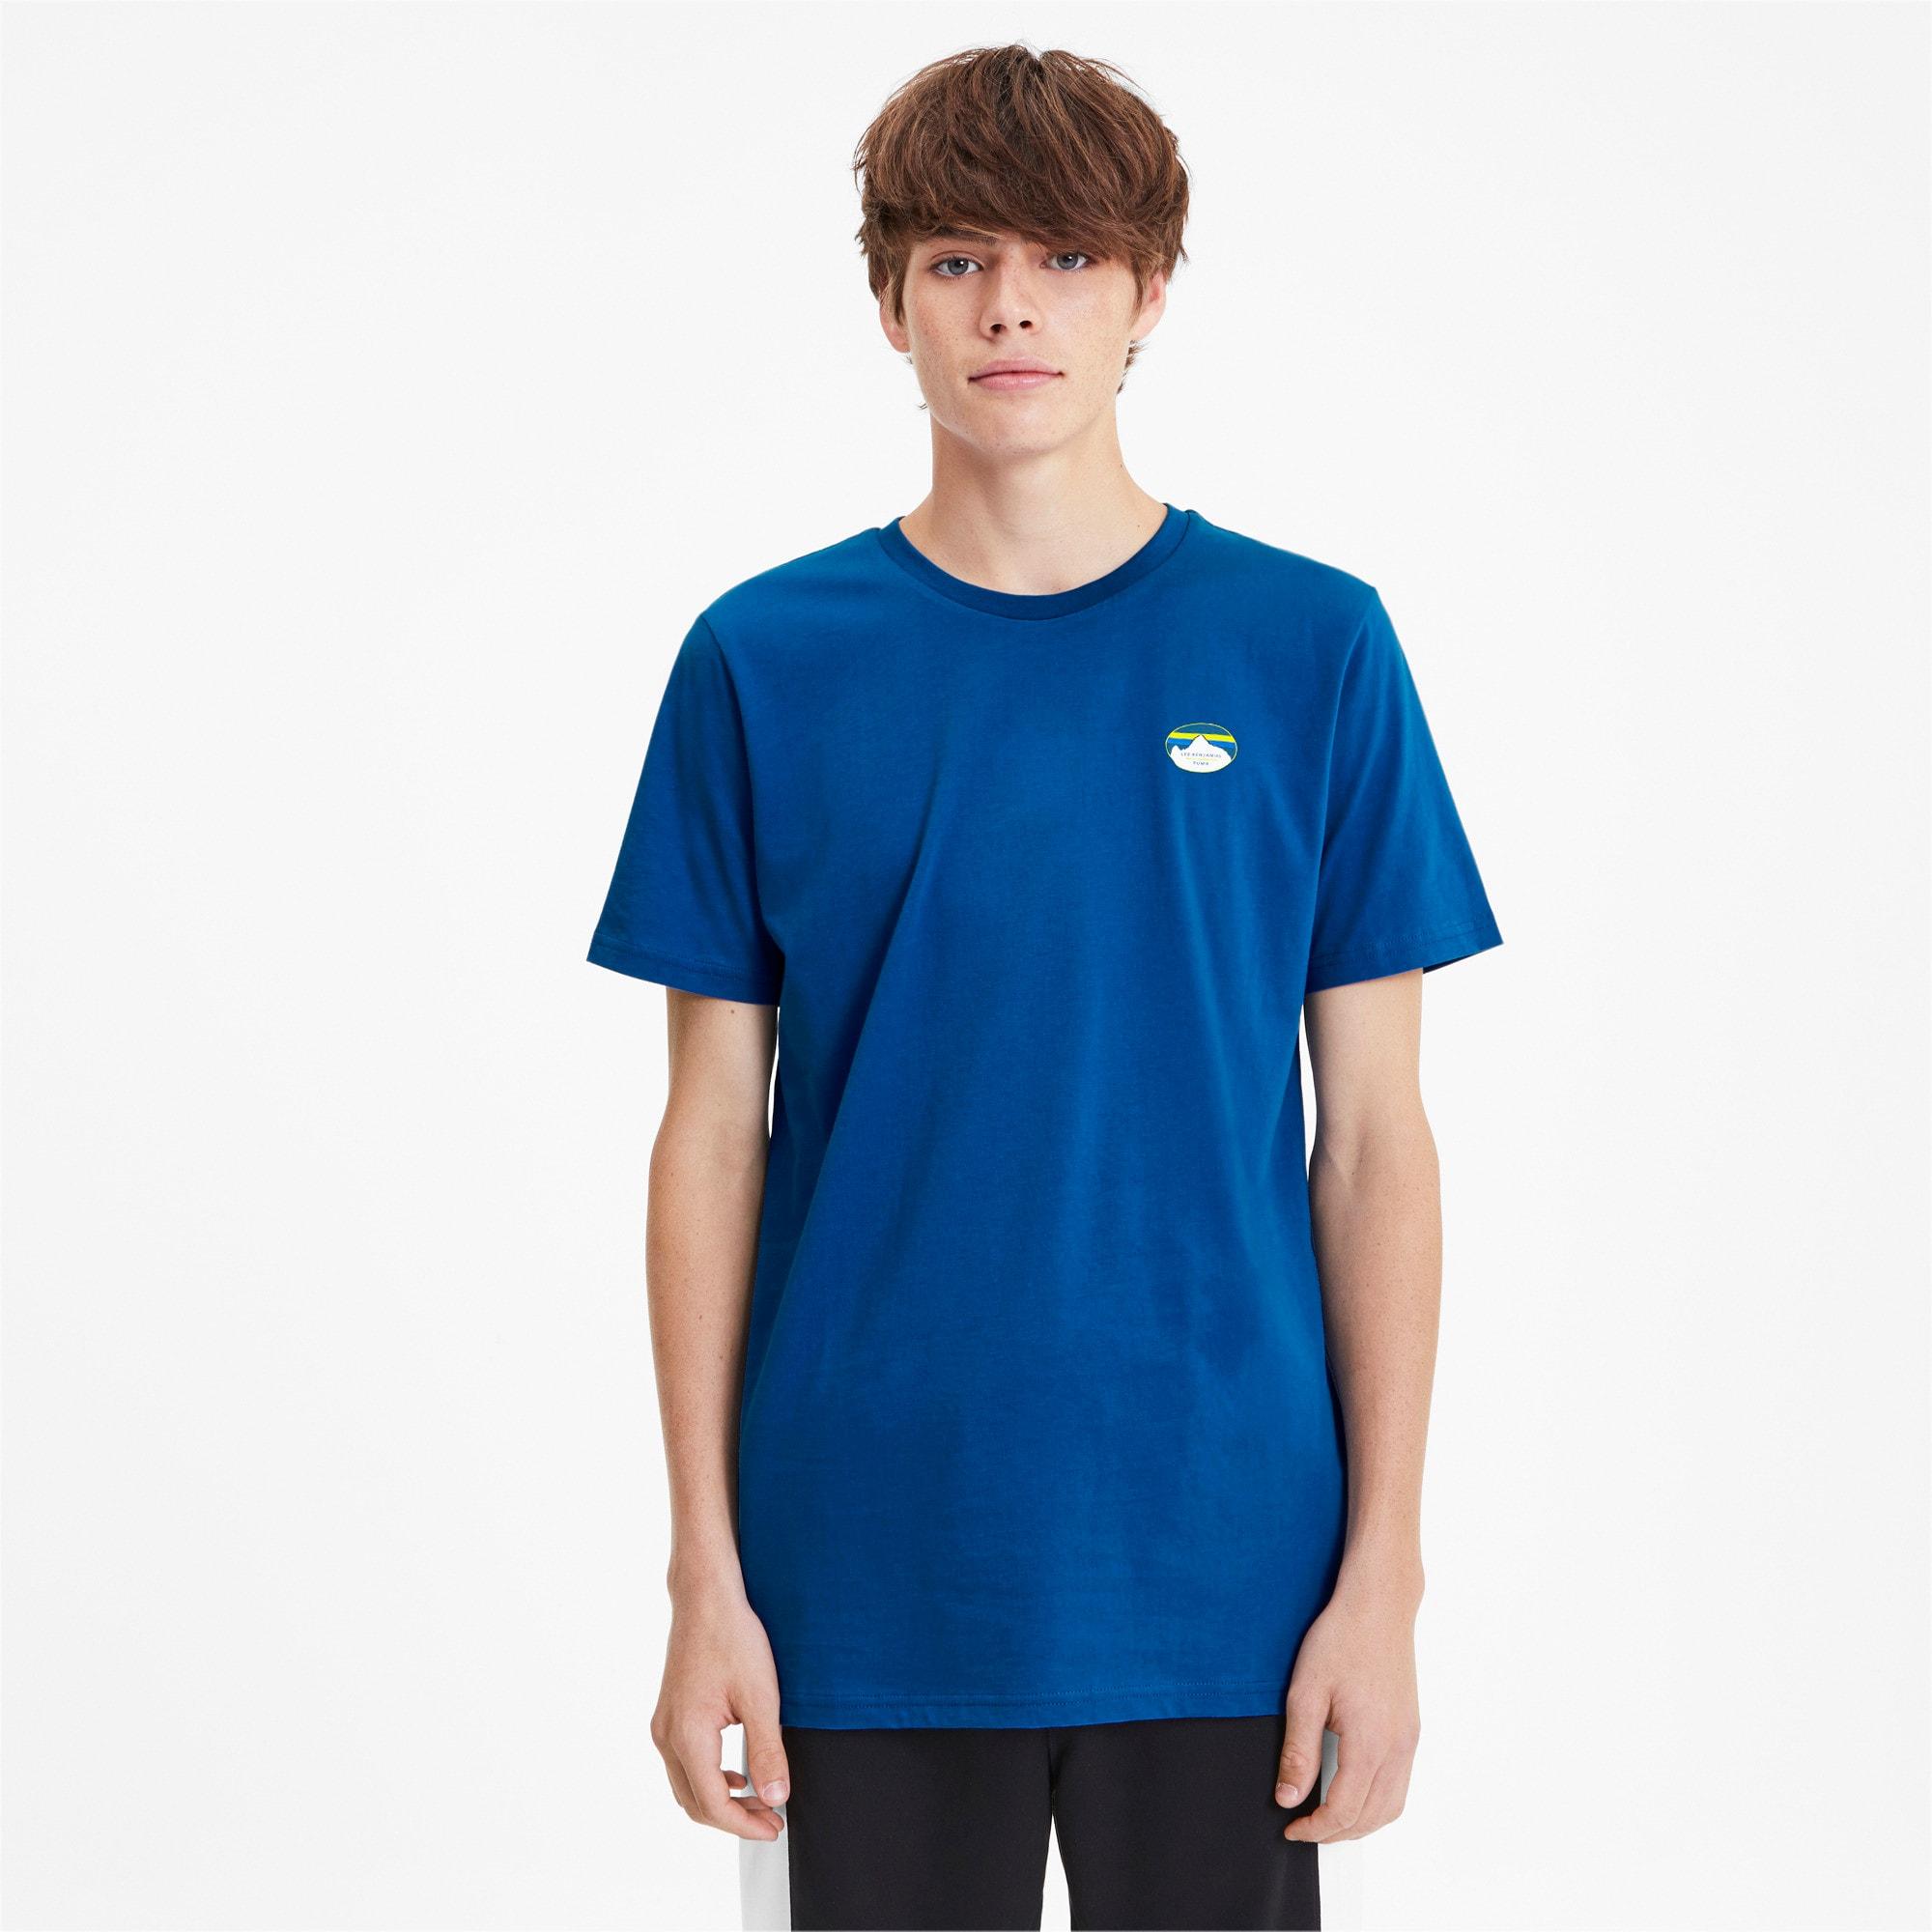 Thumbnail 1 of PUMA x LES BENJAMINS Tシャツ, Galaxy Blue, medium-JPN